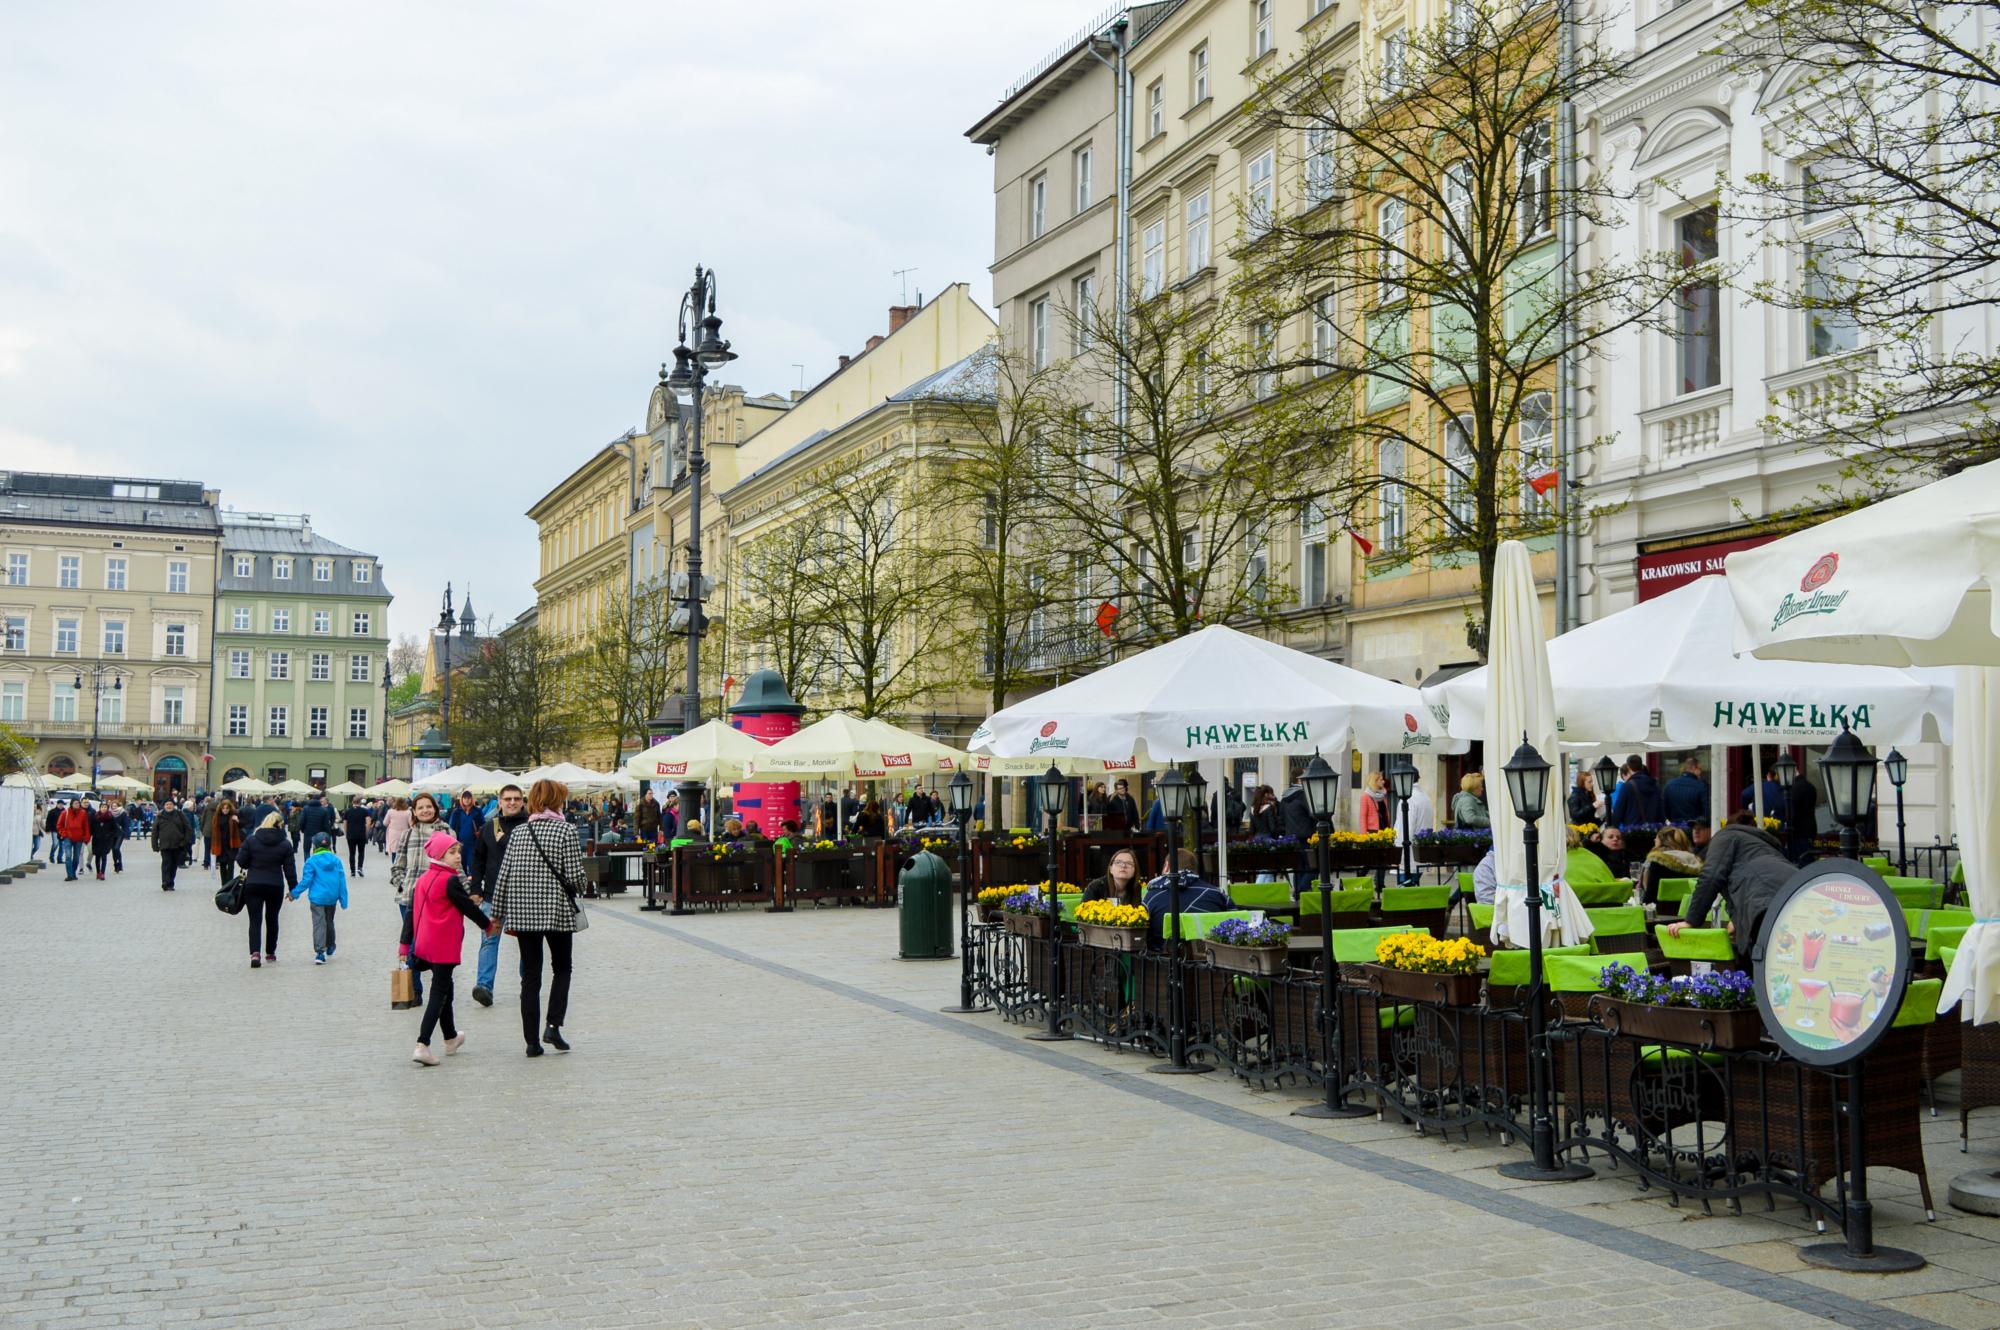 Restaurants around Main Square, Krakow